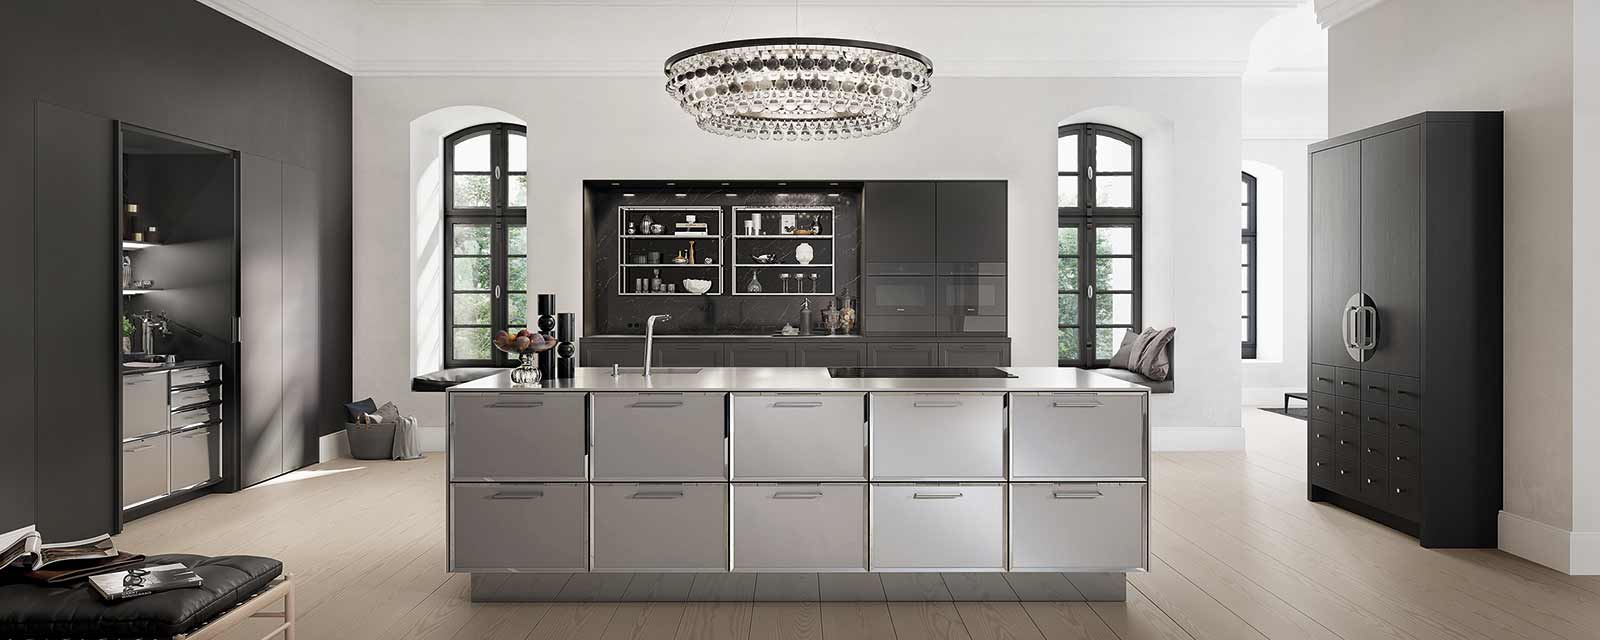 city k chen einbauk chen k chen k chenstudio berlin. Black Bedroom Furniture Sets. Home Design Ideas